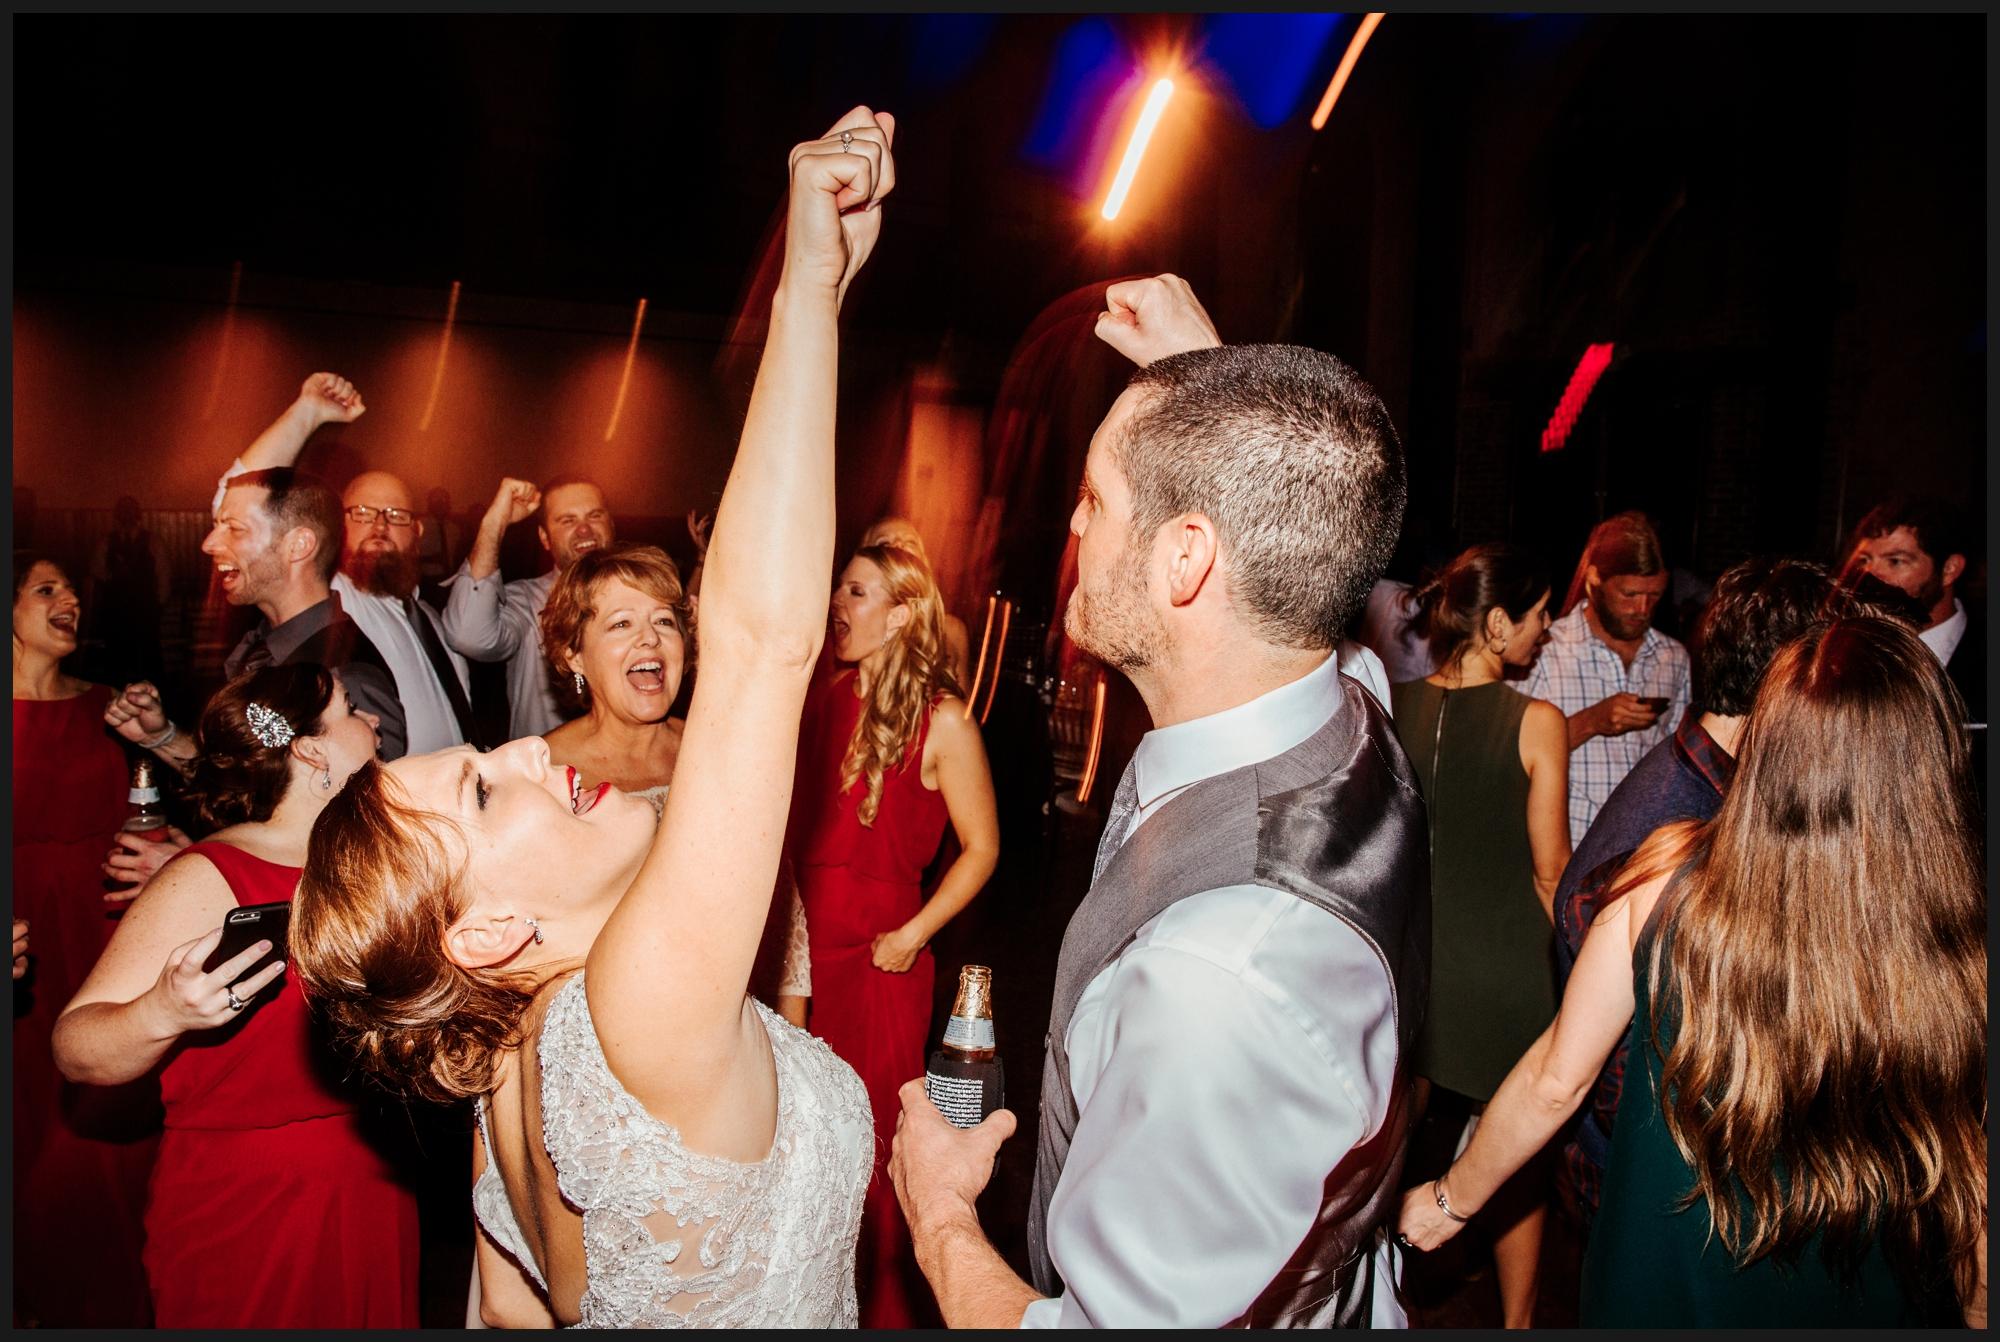 Orlando-Wedding-Photographer-destination-wedding-photographer-florida-wedding-photographer-bohemian-wedding-photographer_0671.jpg